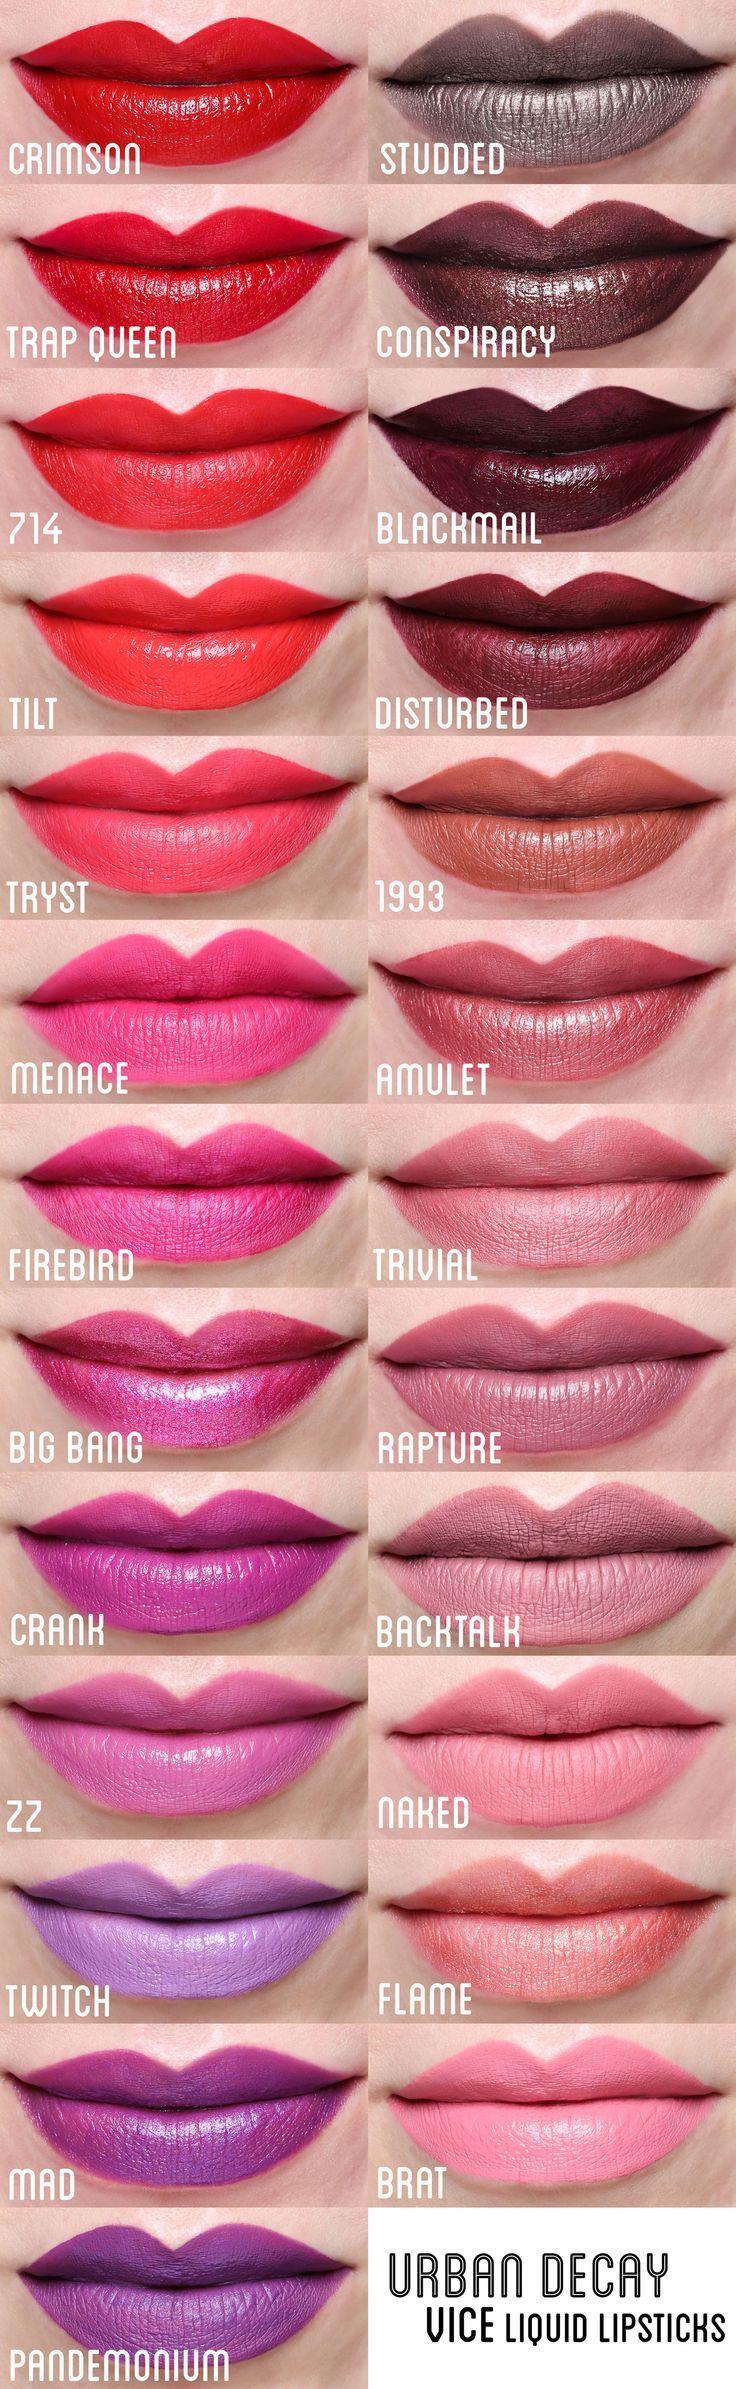 25+ best ideas about Lipstick brands on Pinterest | Lipstick ...